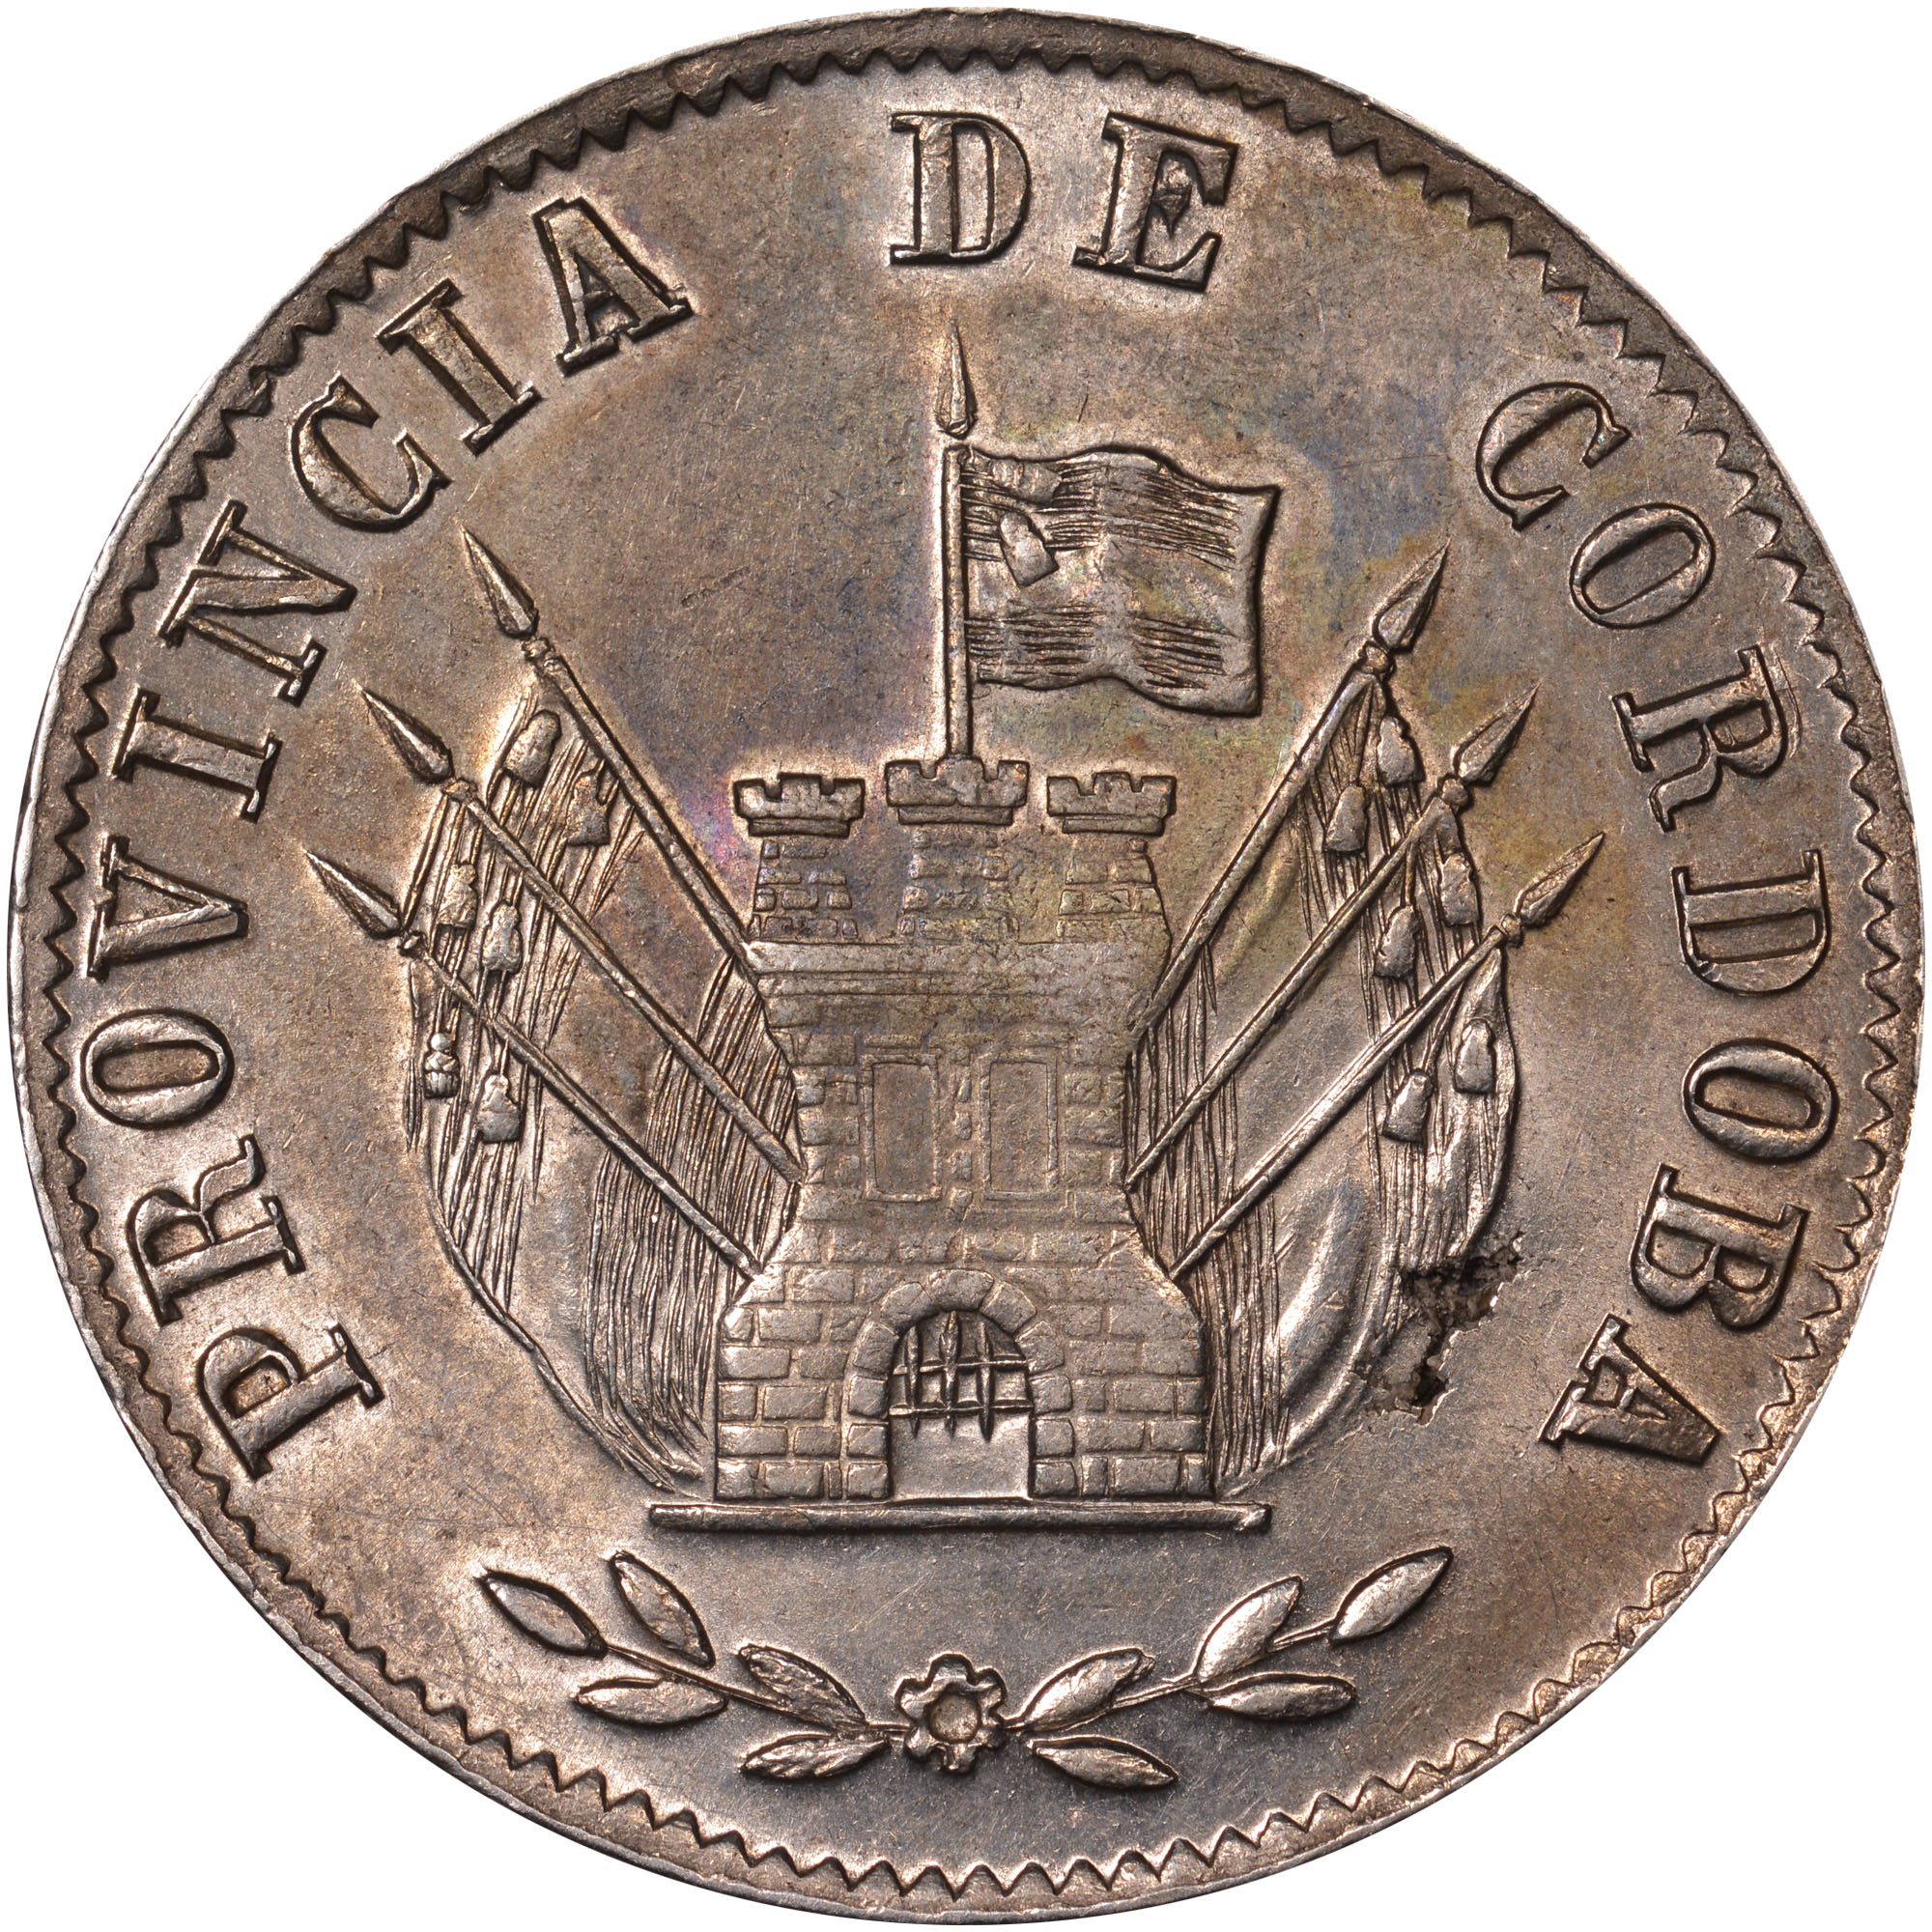 1852 Argentina CORDOBA 8 Reales obverse